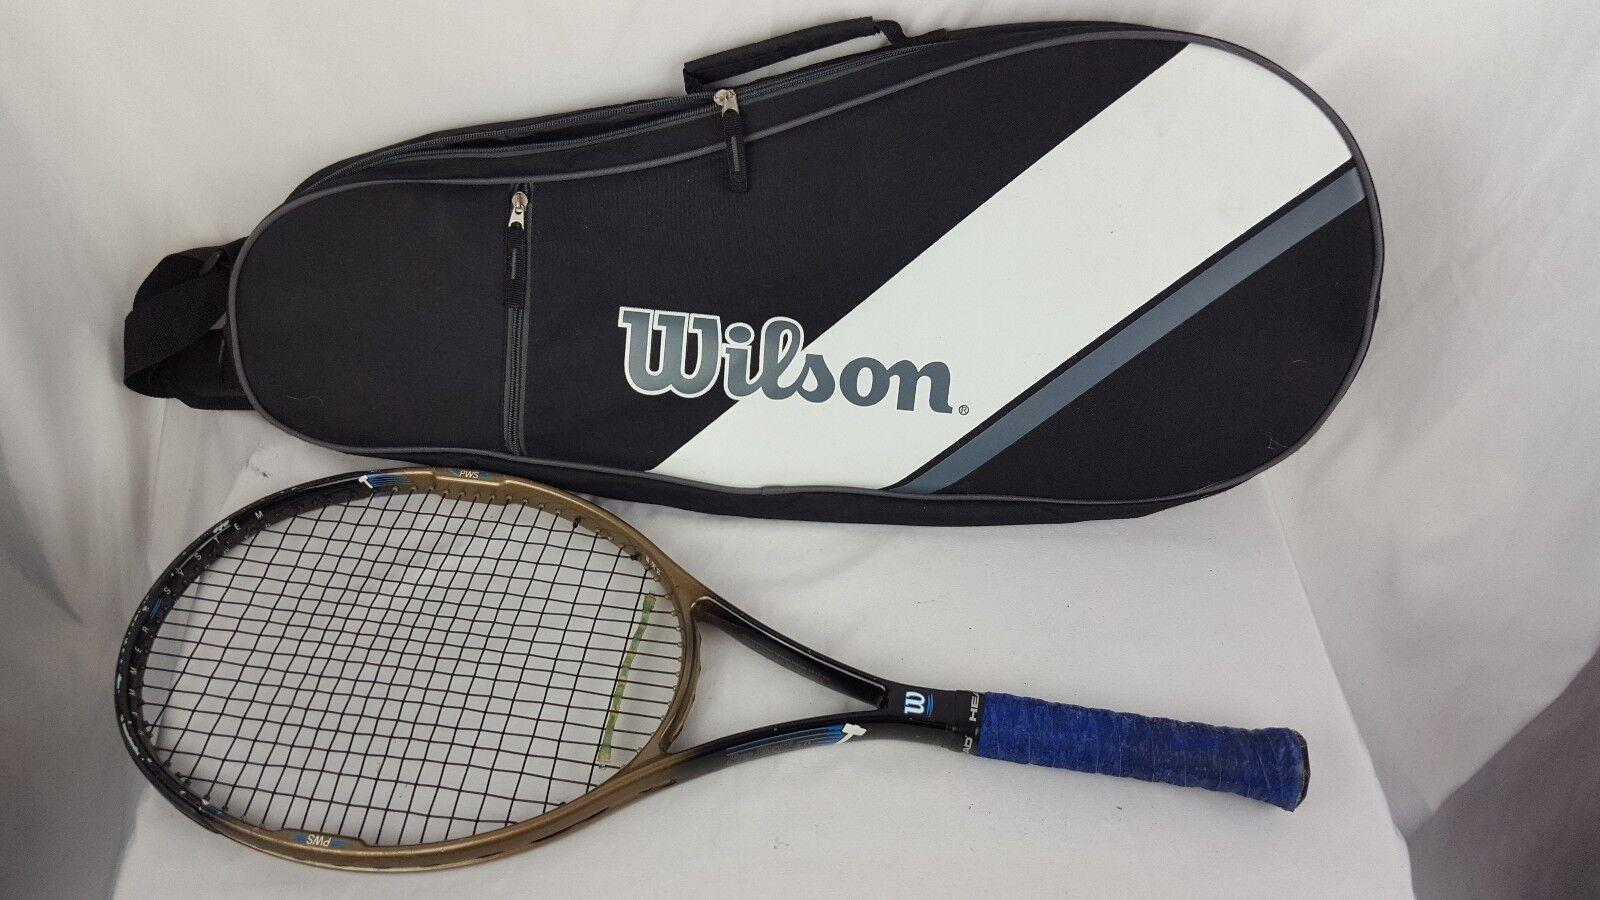 Wilson  Pro Staff 4.0 Martillo sistema tenis raqueta 4 3 8 con 2 Raqueta Bolsa De Transporte  orden en línea